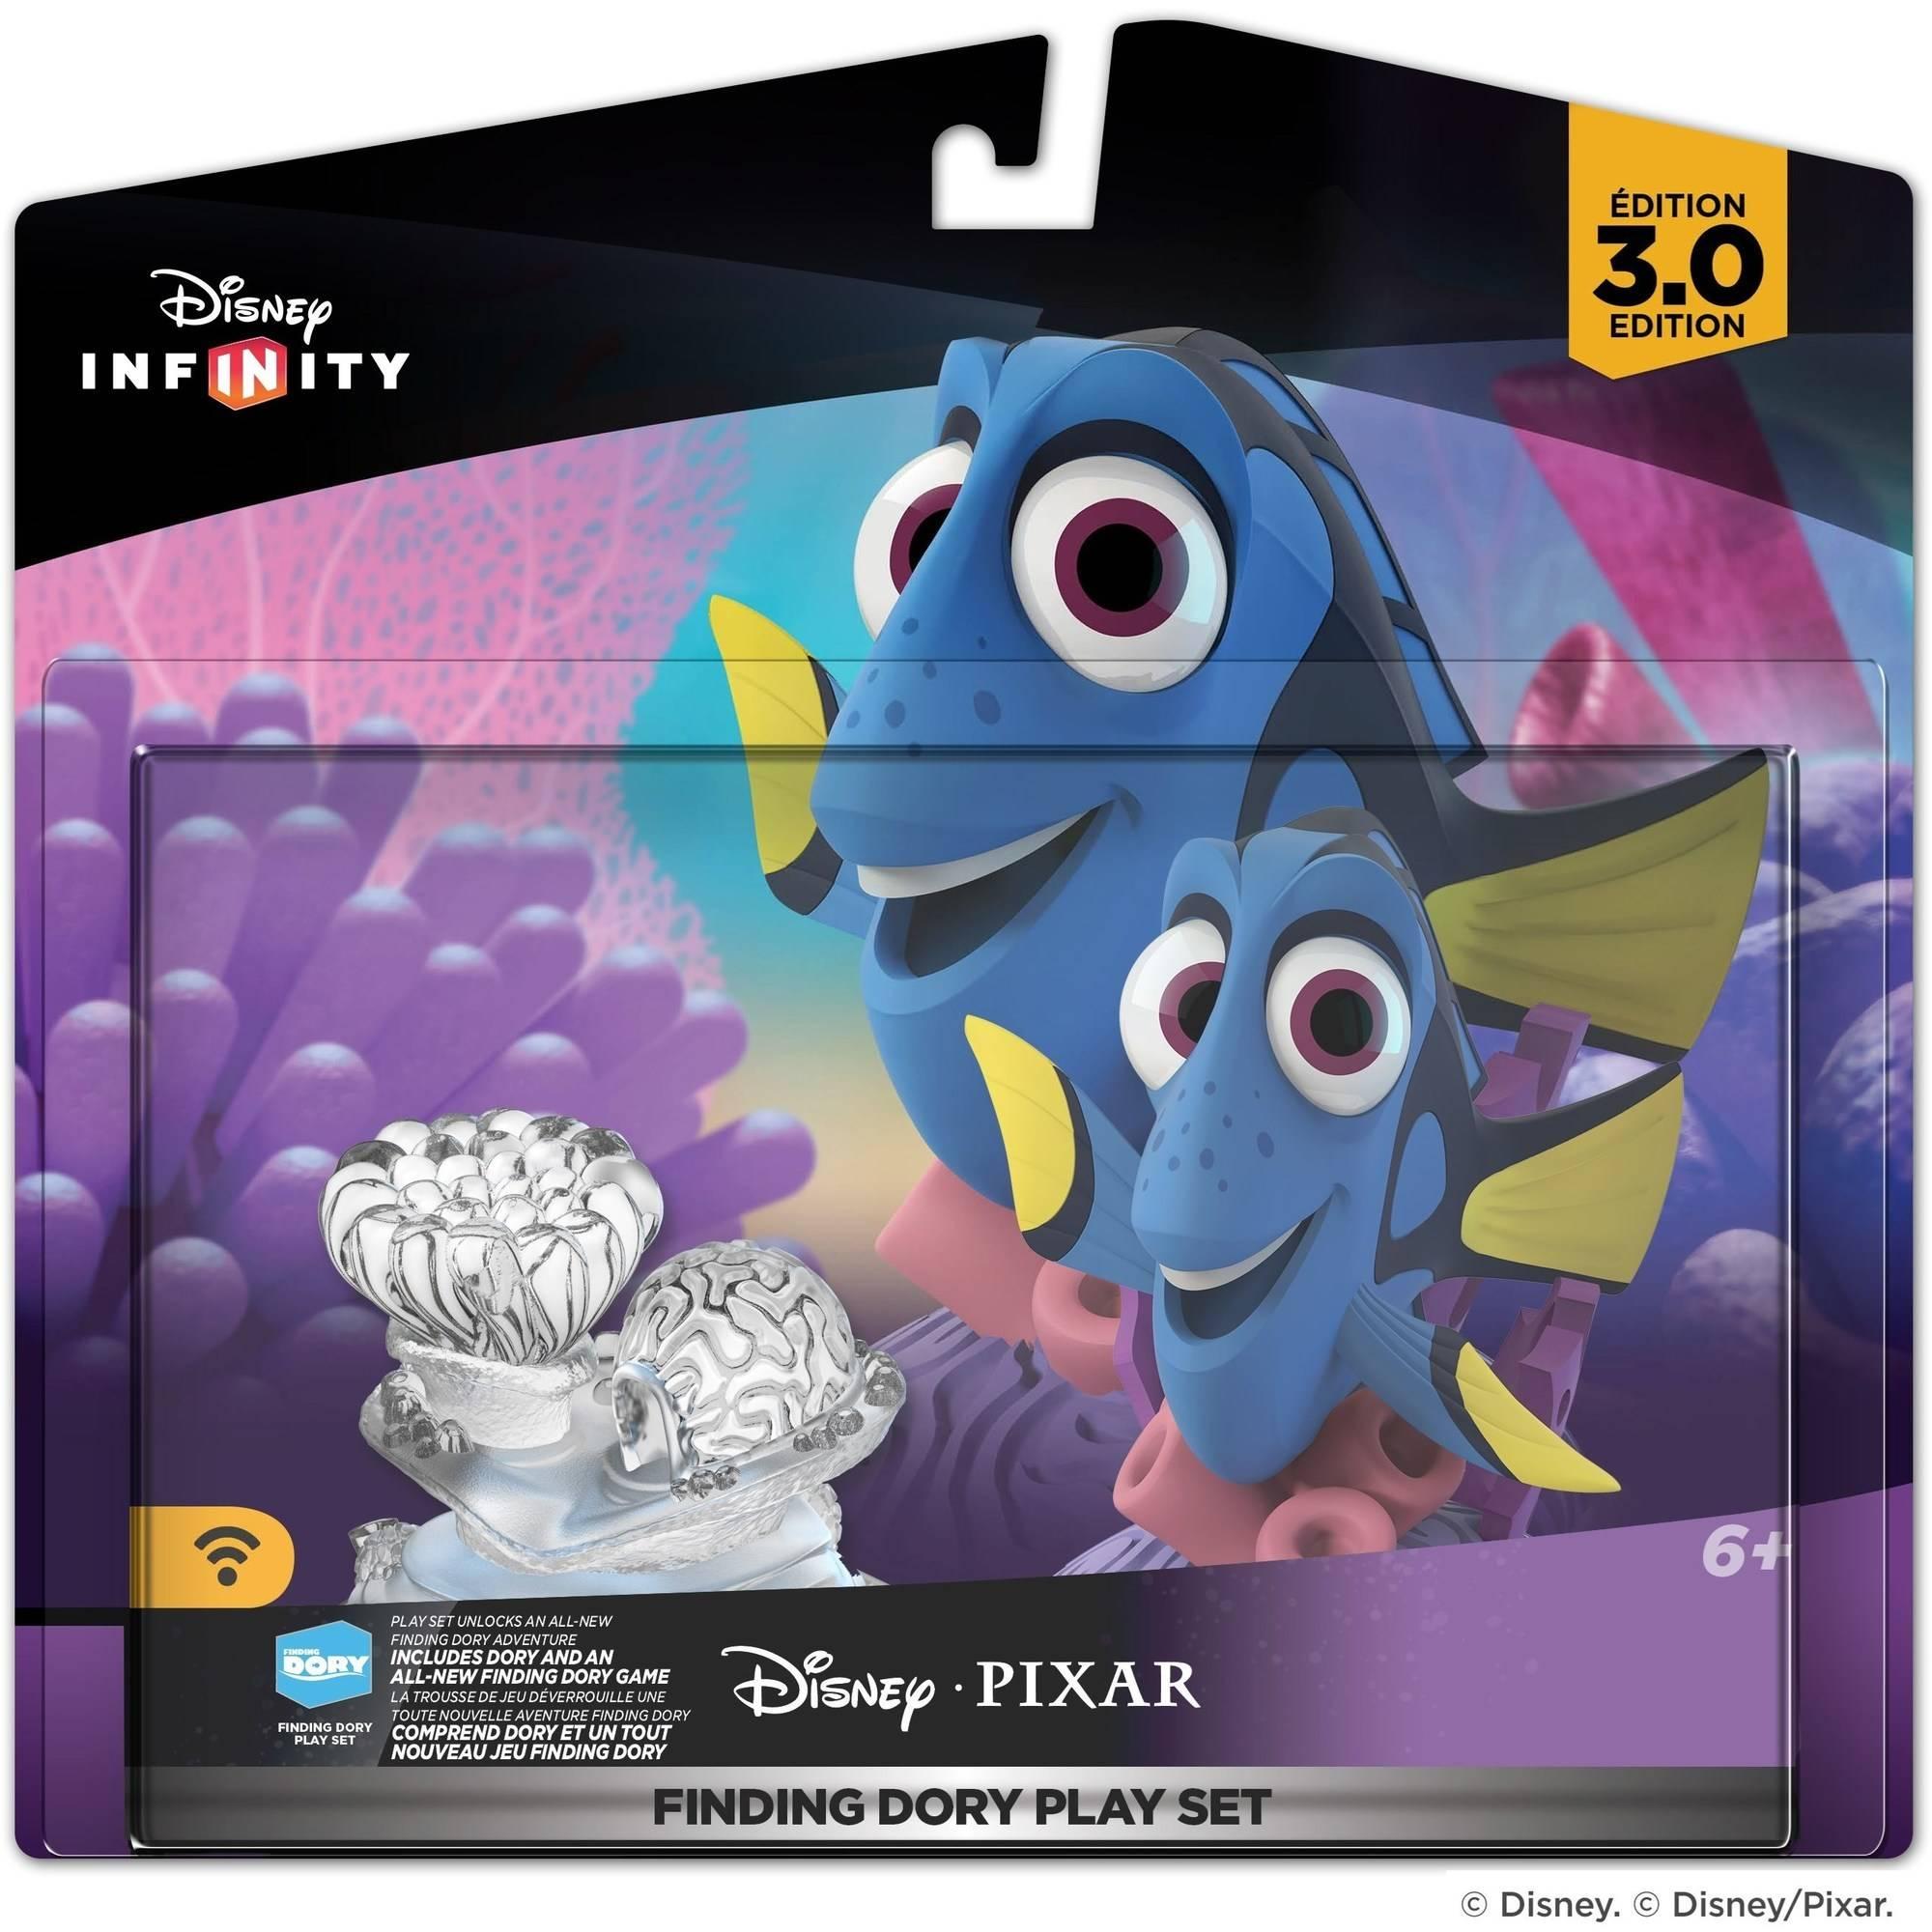 Disney Infinity 3.0 Disney*Pixar's Finding Dory Playset (Universal)